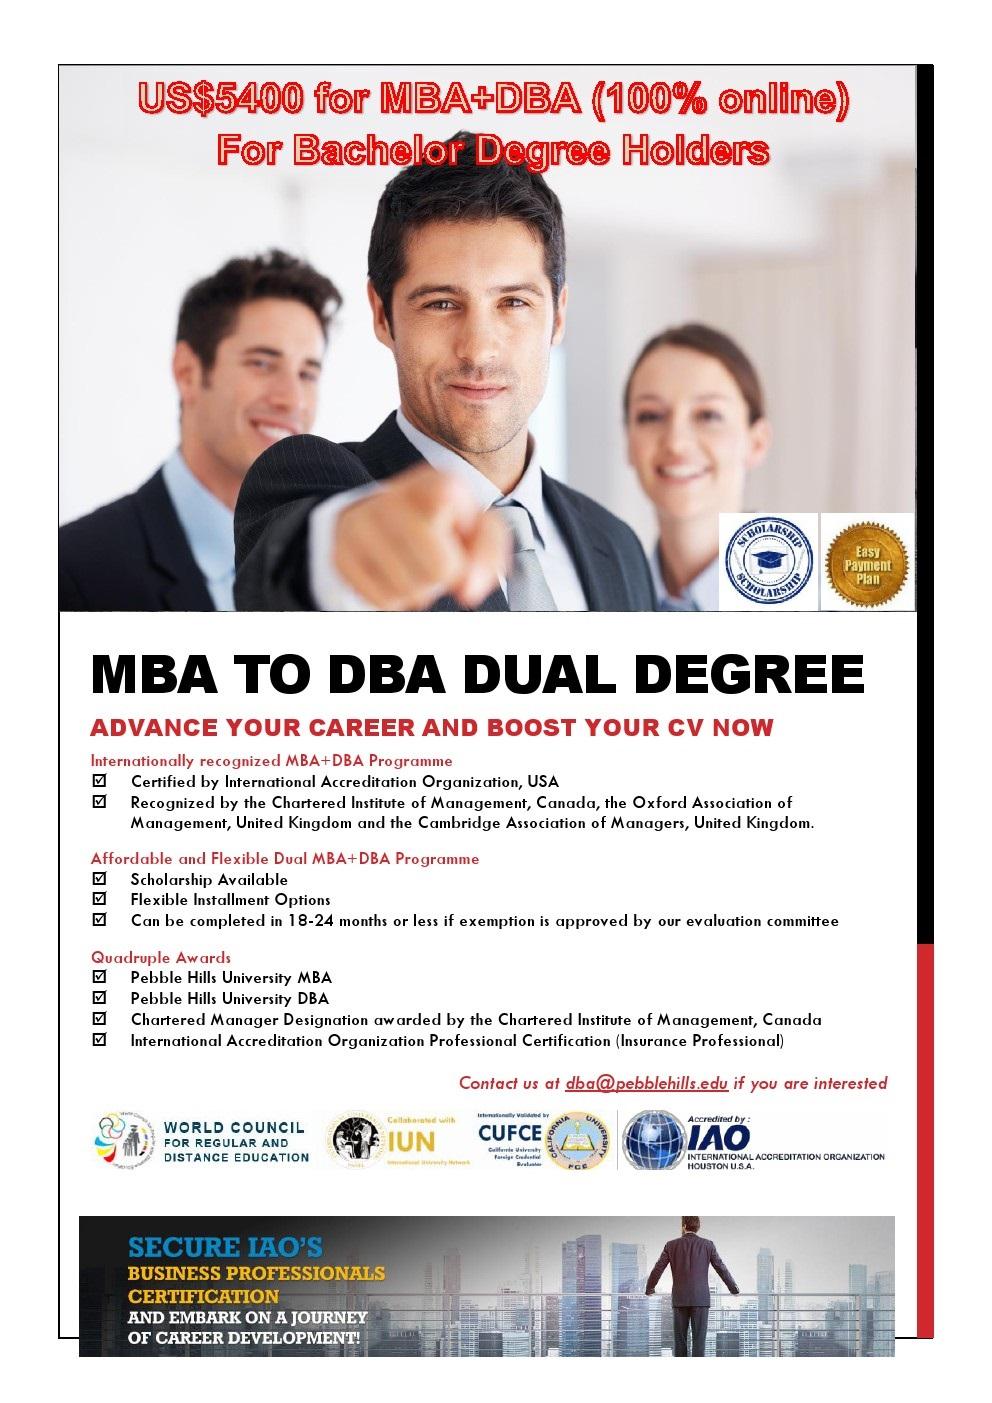 MBA DBA Dual Degree Brochure (for Bachelor)